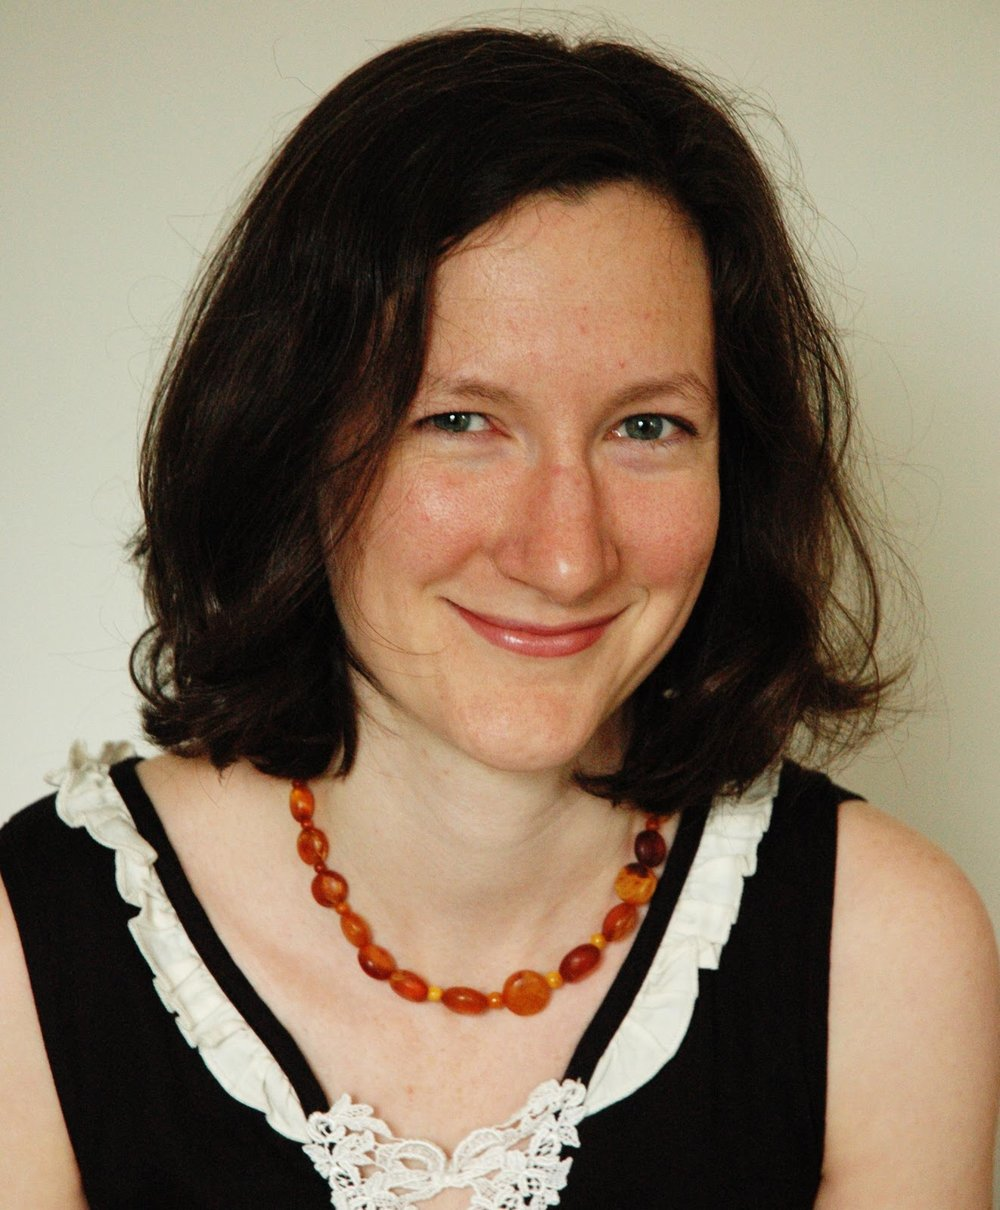 Isabel Elane Allen, Biostattistics & Epidemilolgy